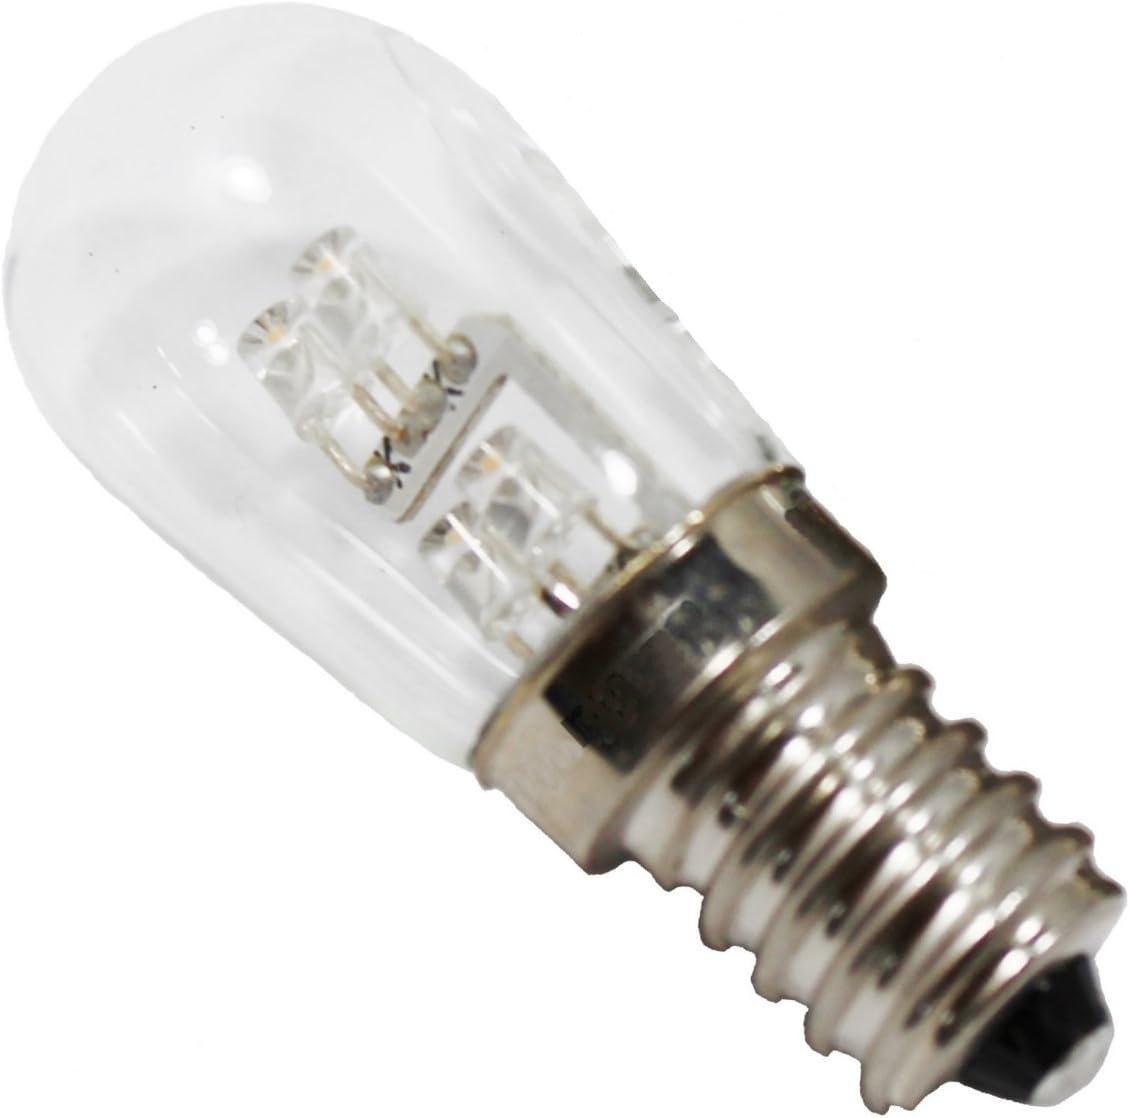 Philips 7w 120v C7 Clear E12 Indicator Incandescent Light Bulb